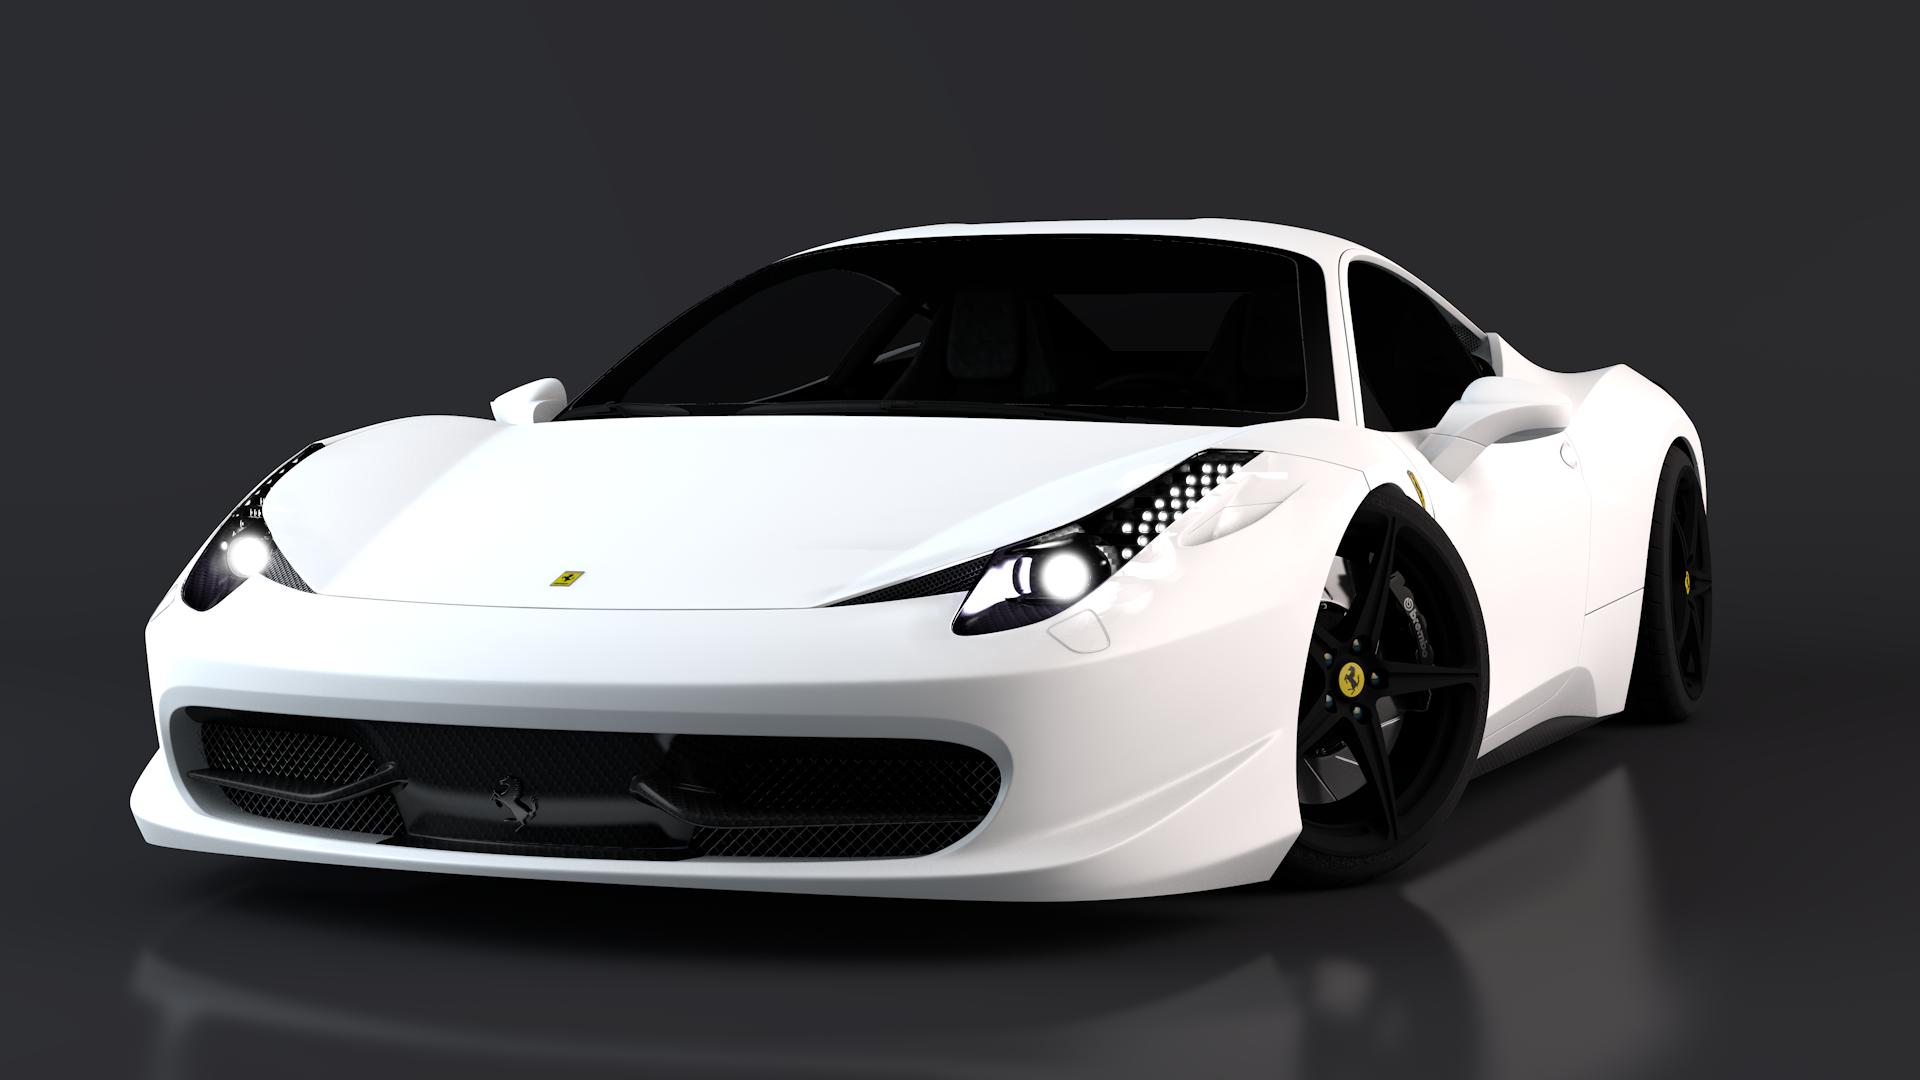 uae take ferrari al ain speciale sale delivery first motors for auto class trader post news